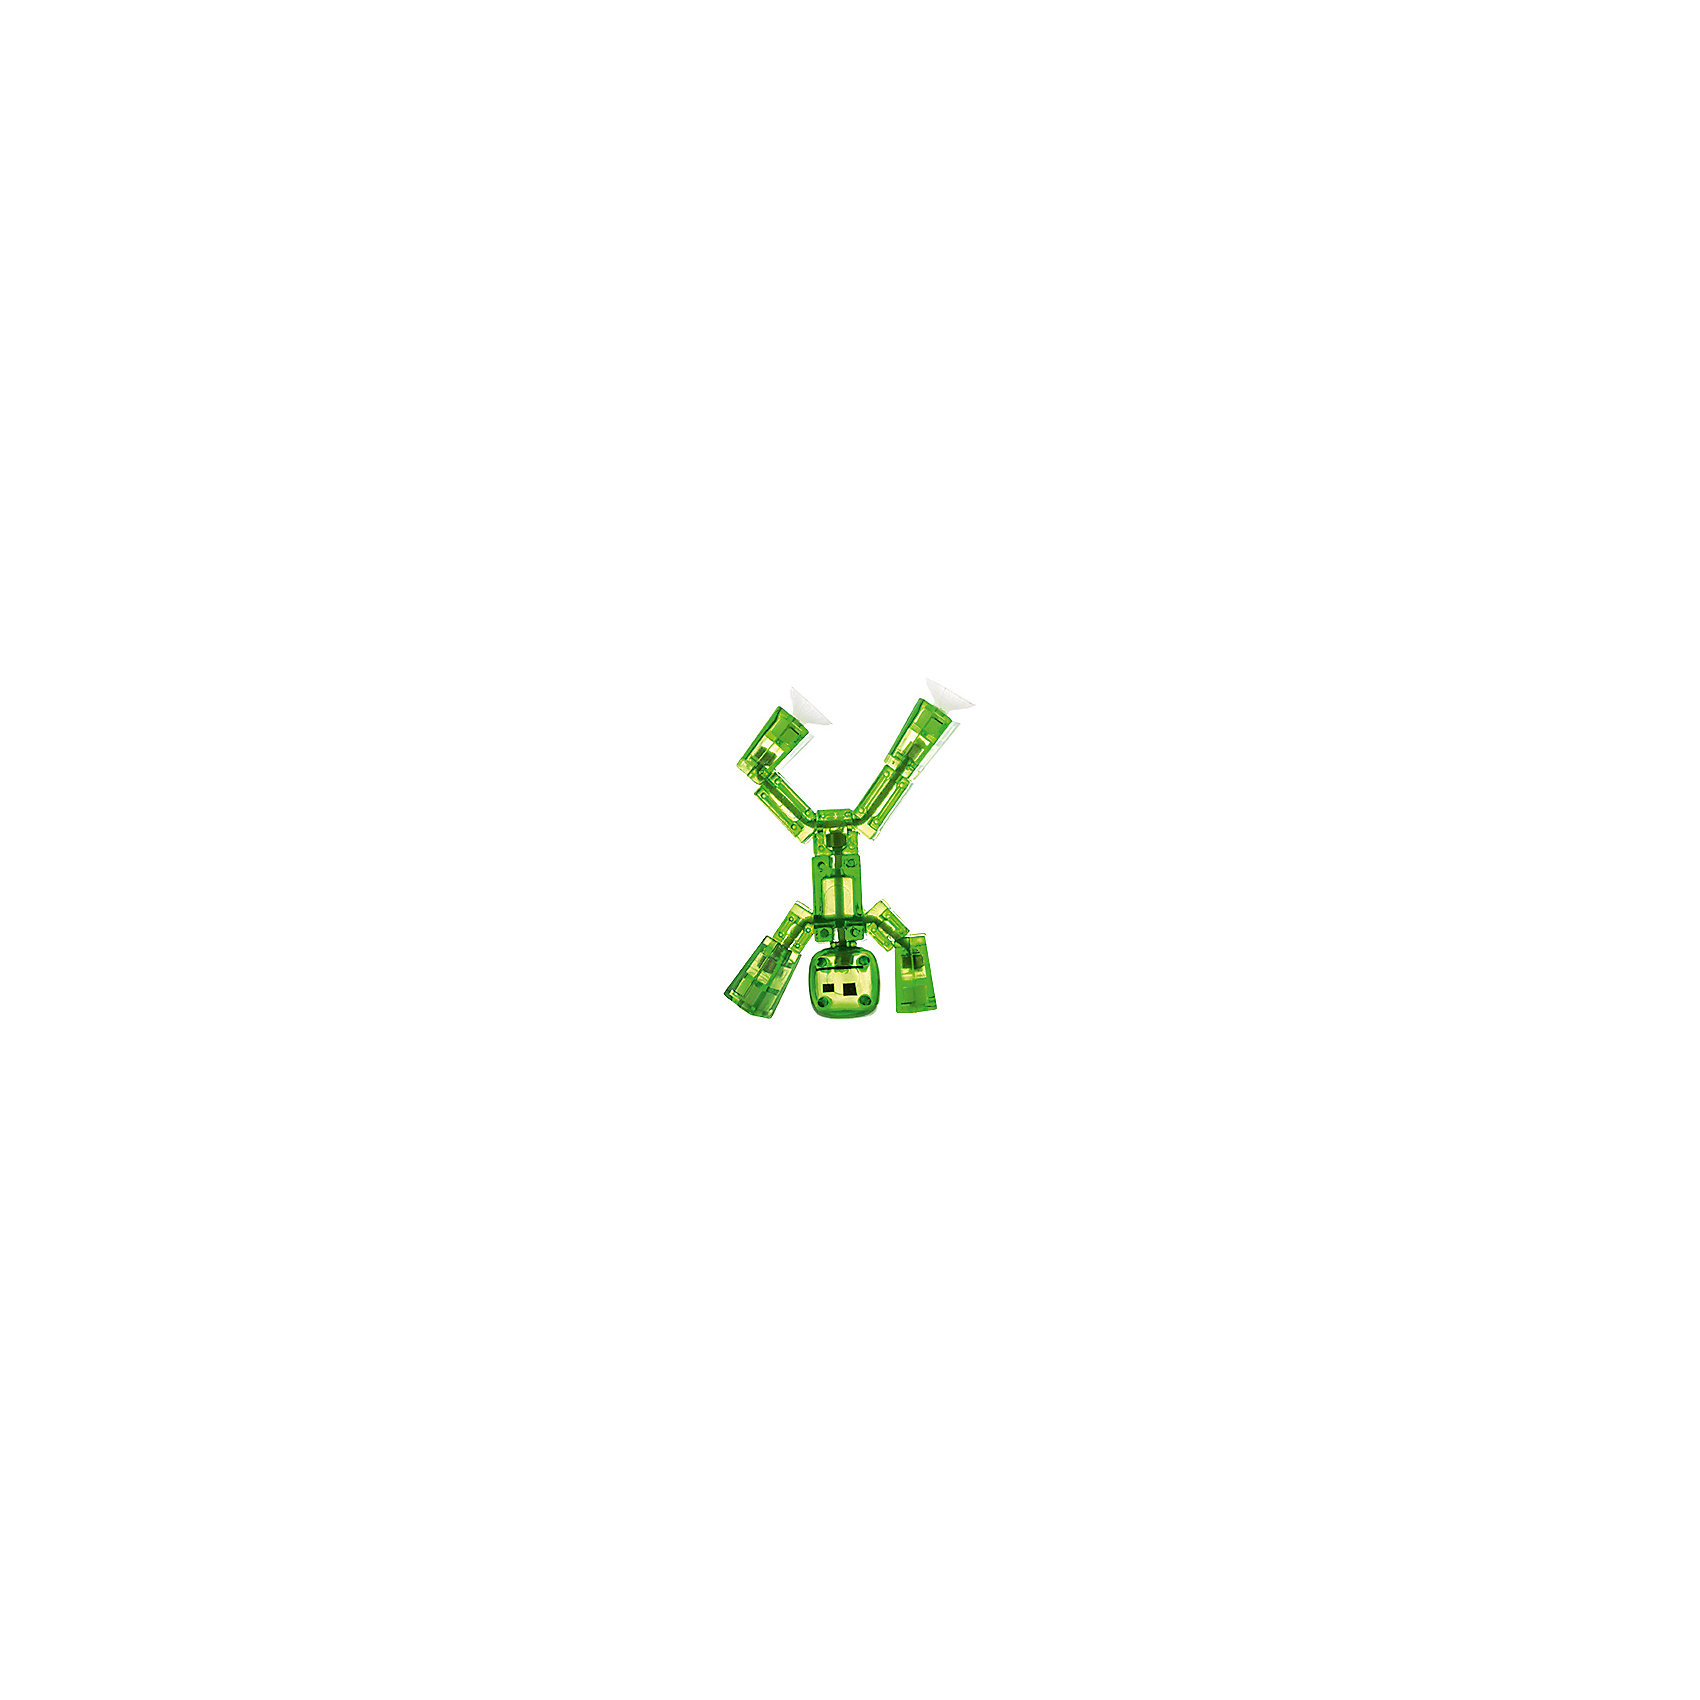 - Игрушка-фигурка, зеленая, Stikbot фигурка stikbot 8 см в ассортименте